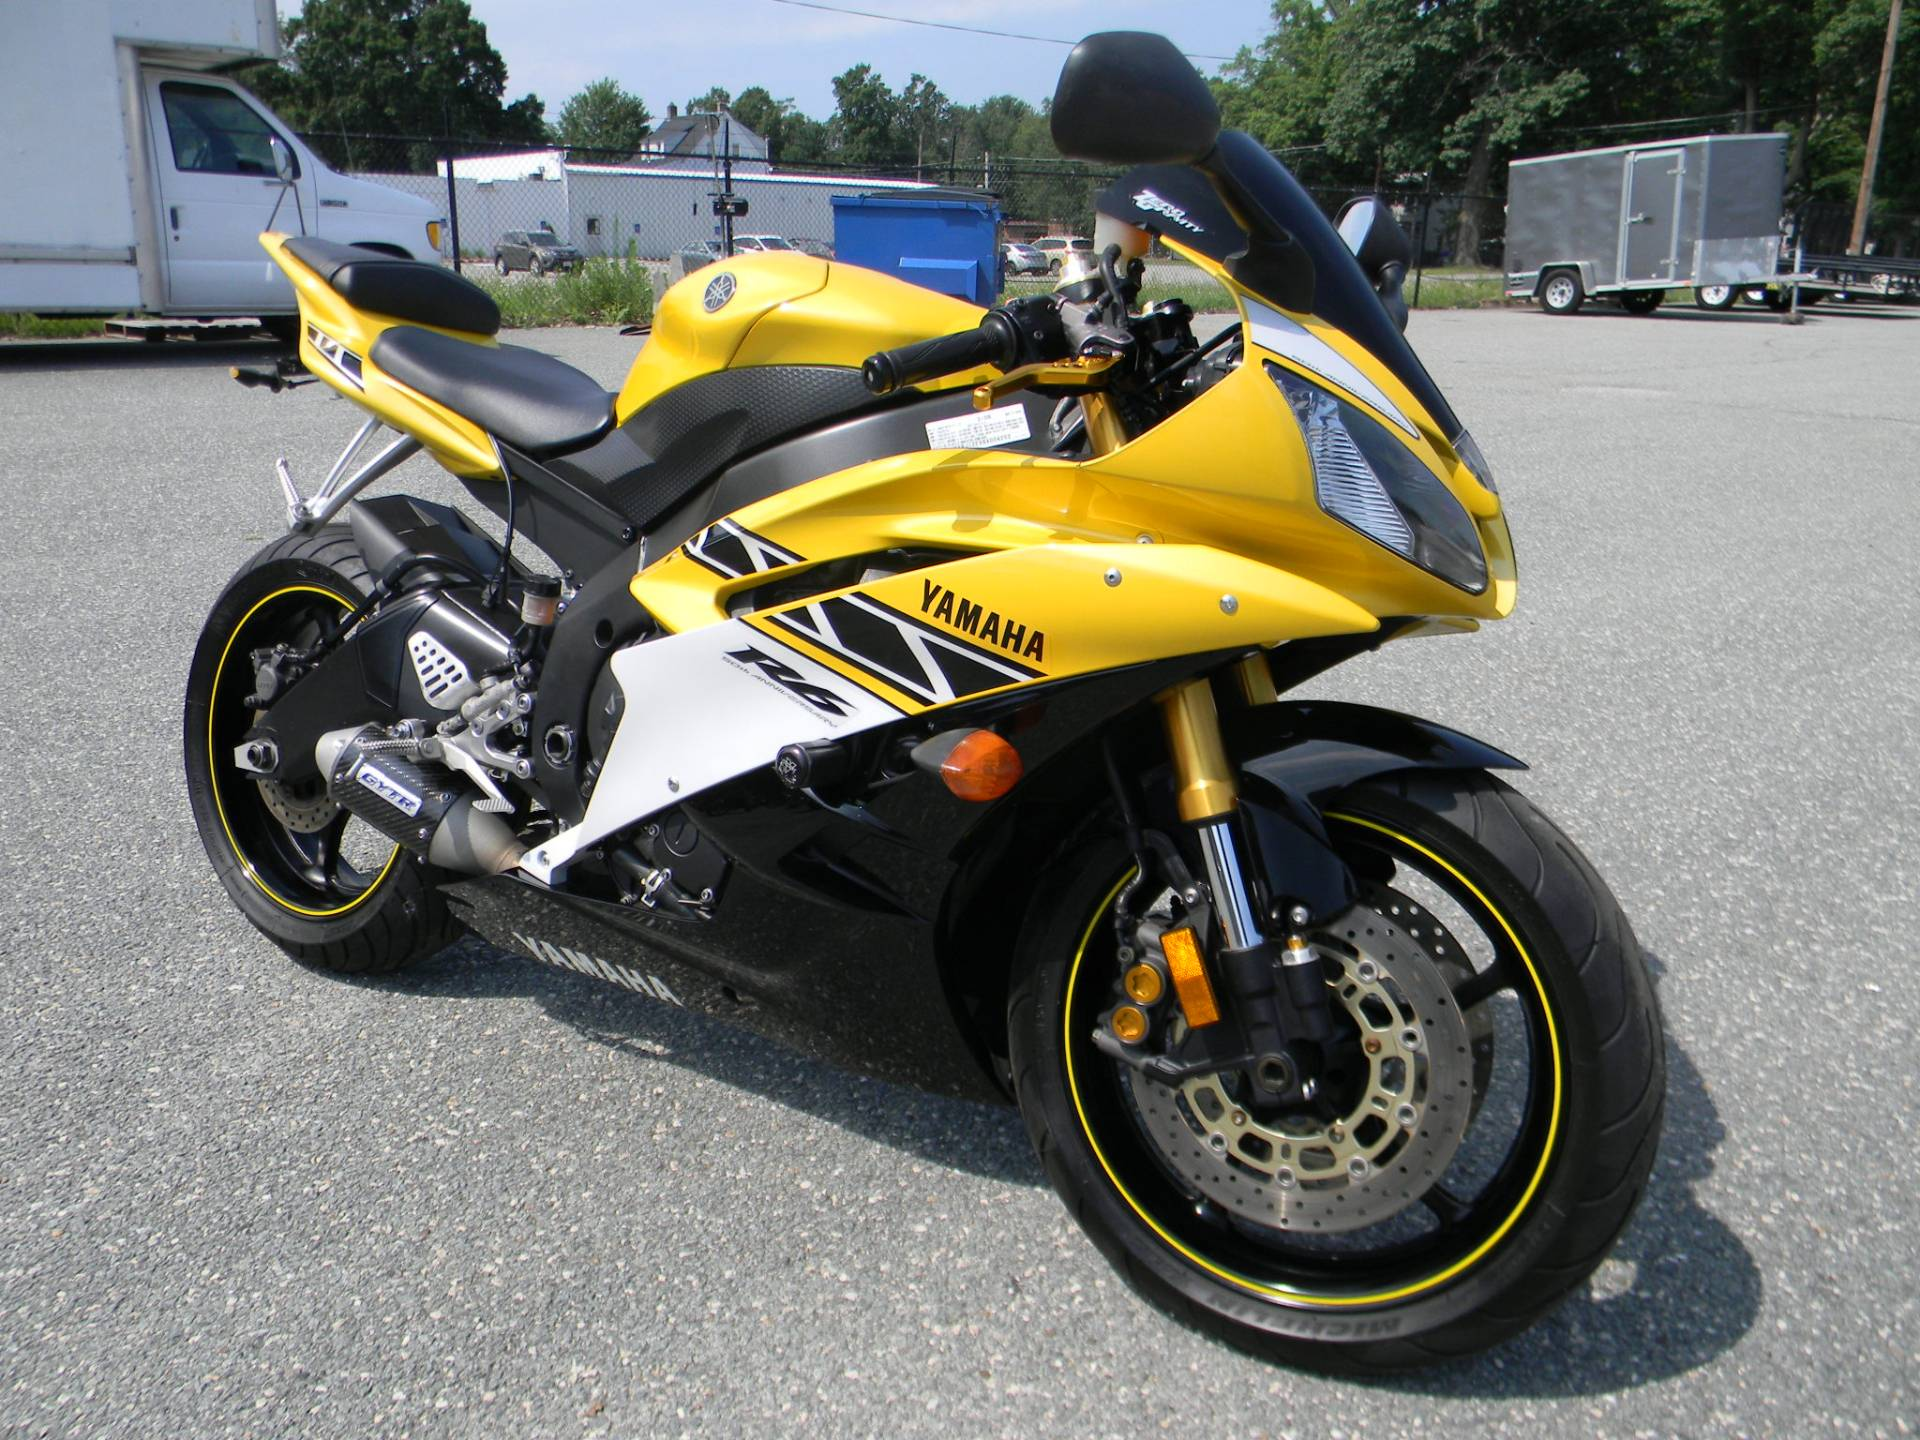 2006 Yamaha YZF-R6 2